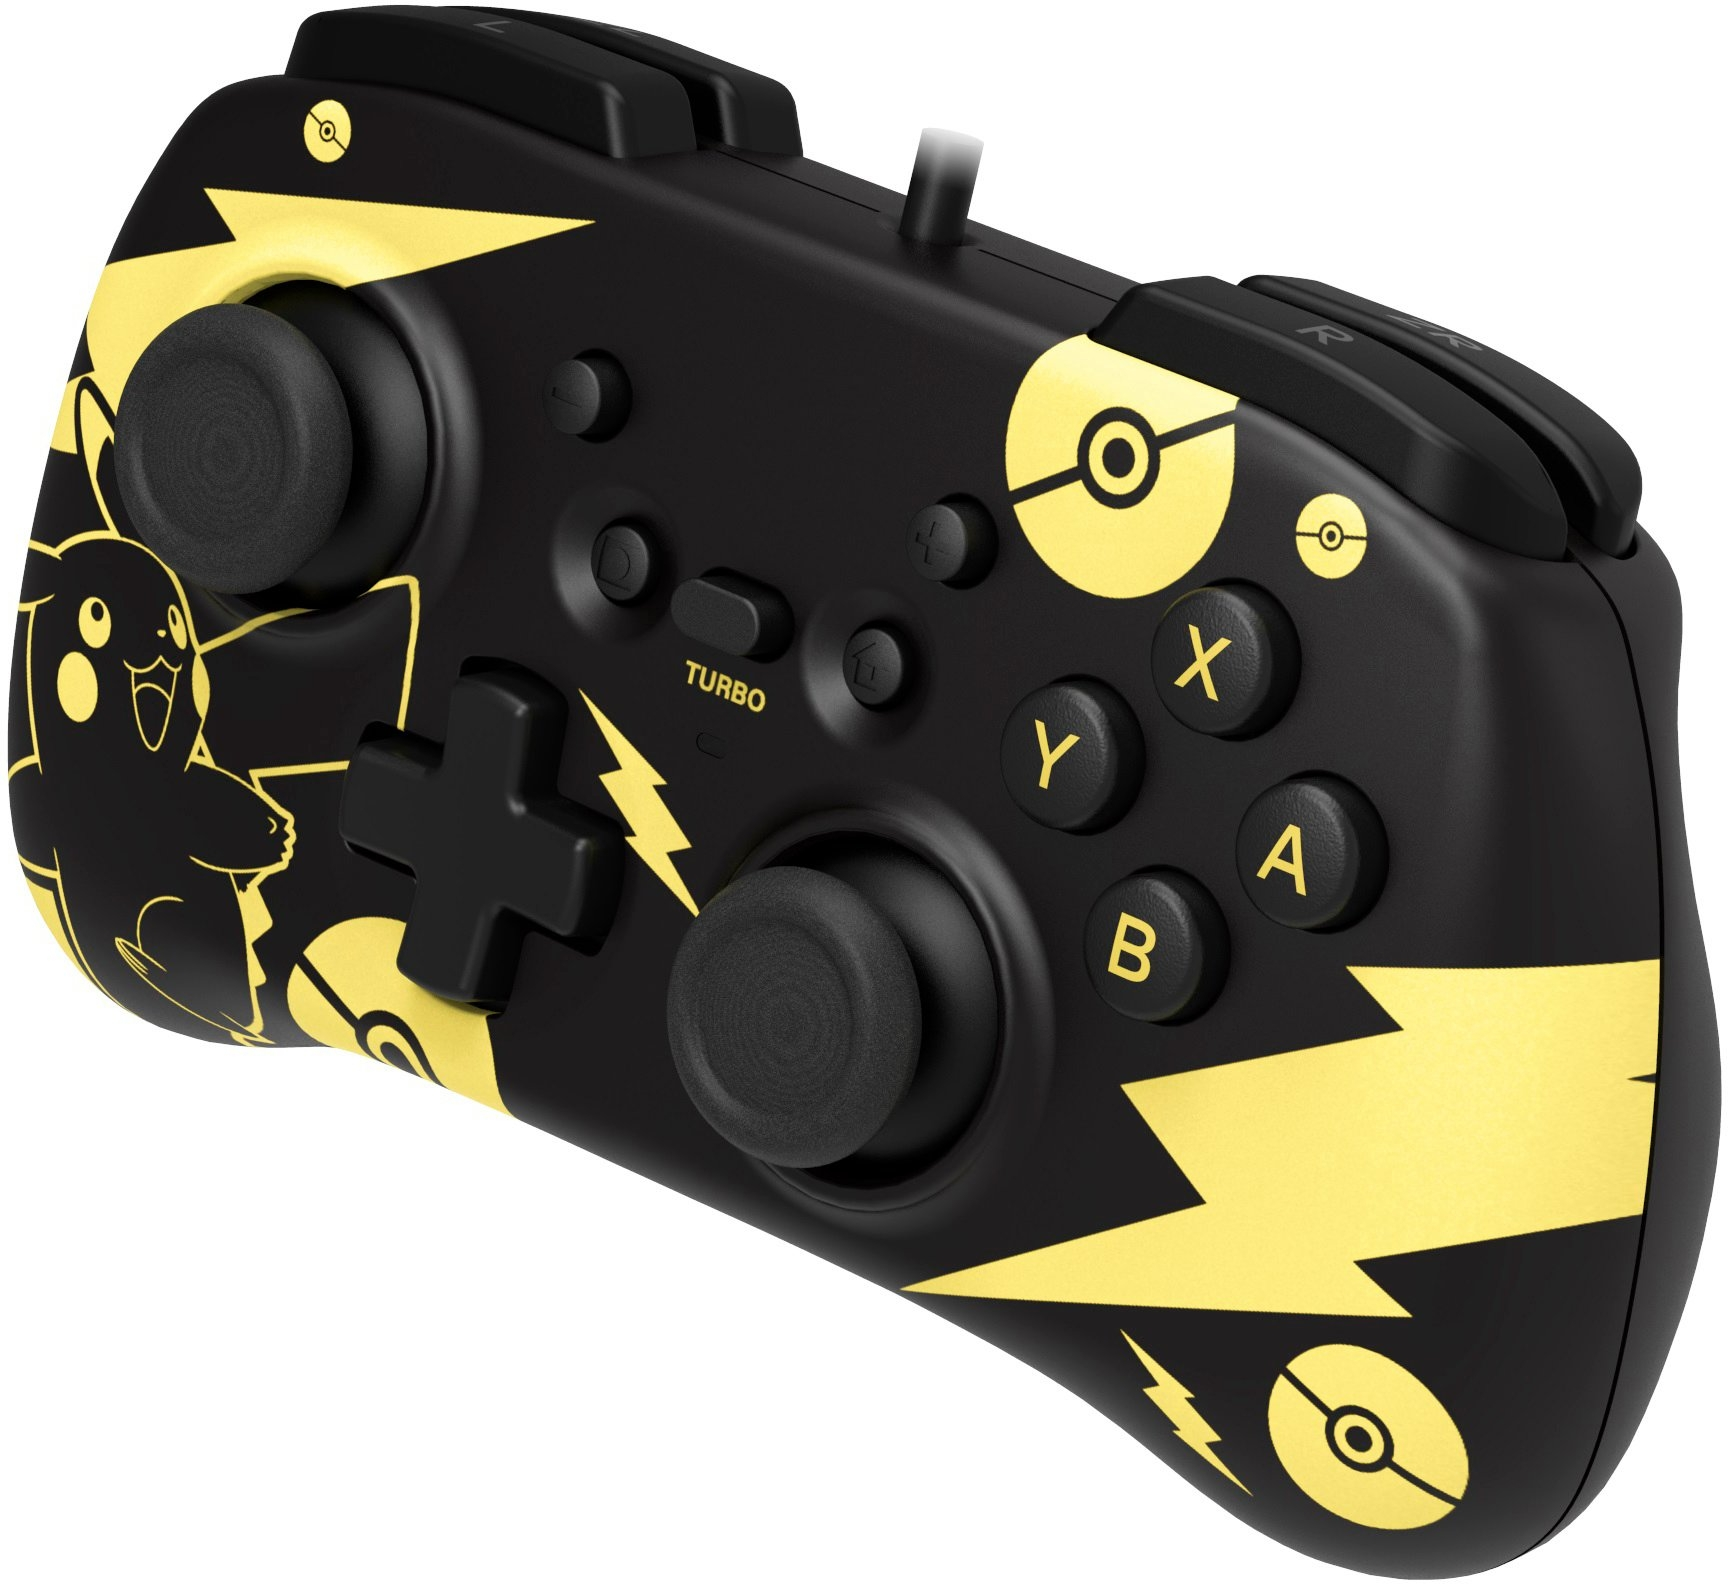 Hori controller Switch Mini Controller - Pikachu Black & Gold Edition - gratis ruilen op otto.nl